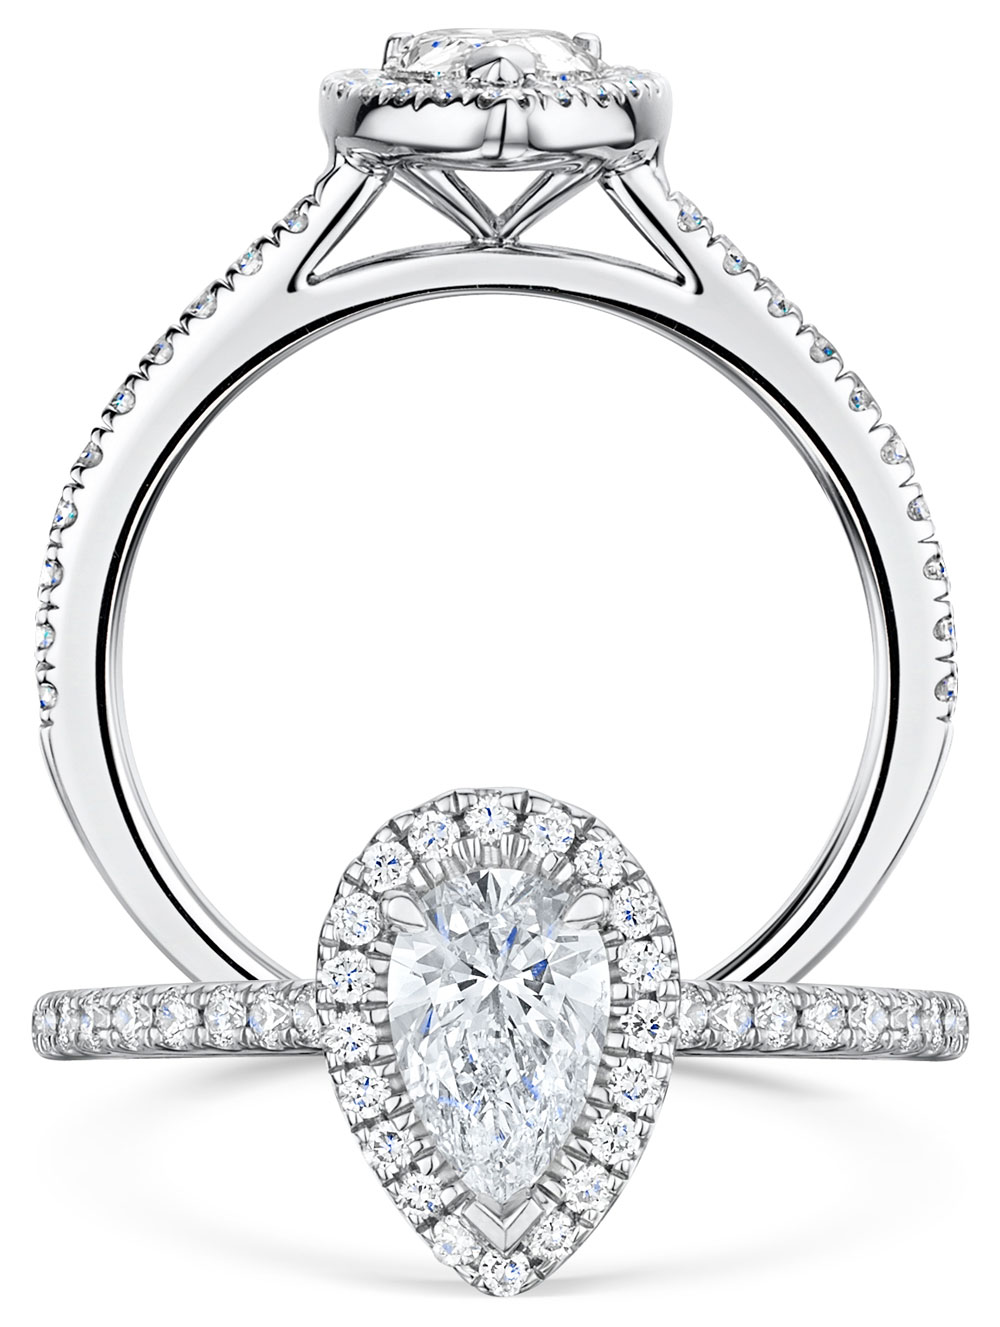 Halo Pear Cut Diamond Ring